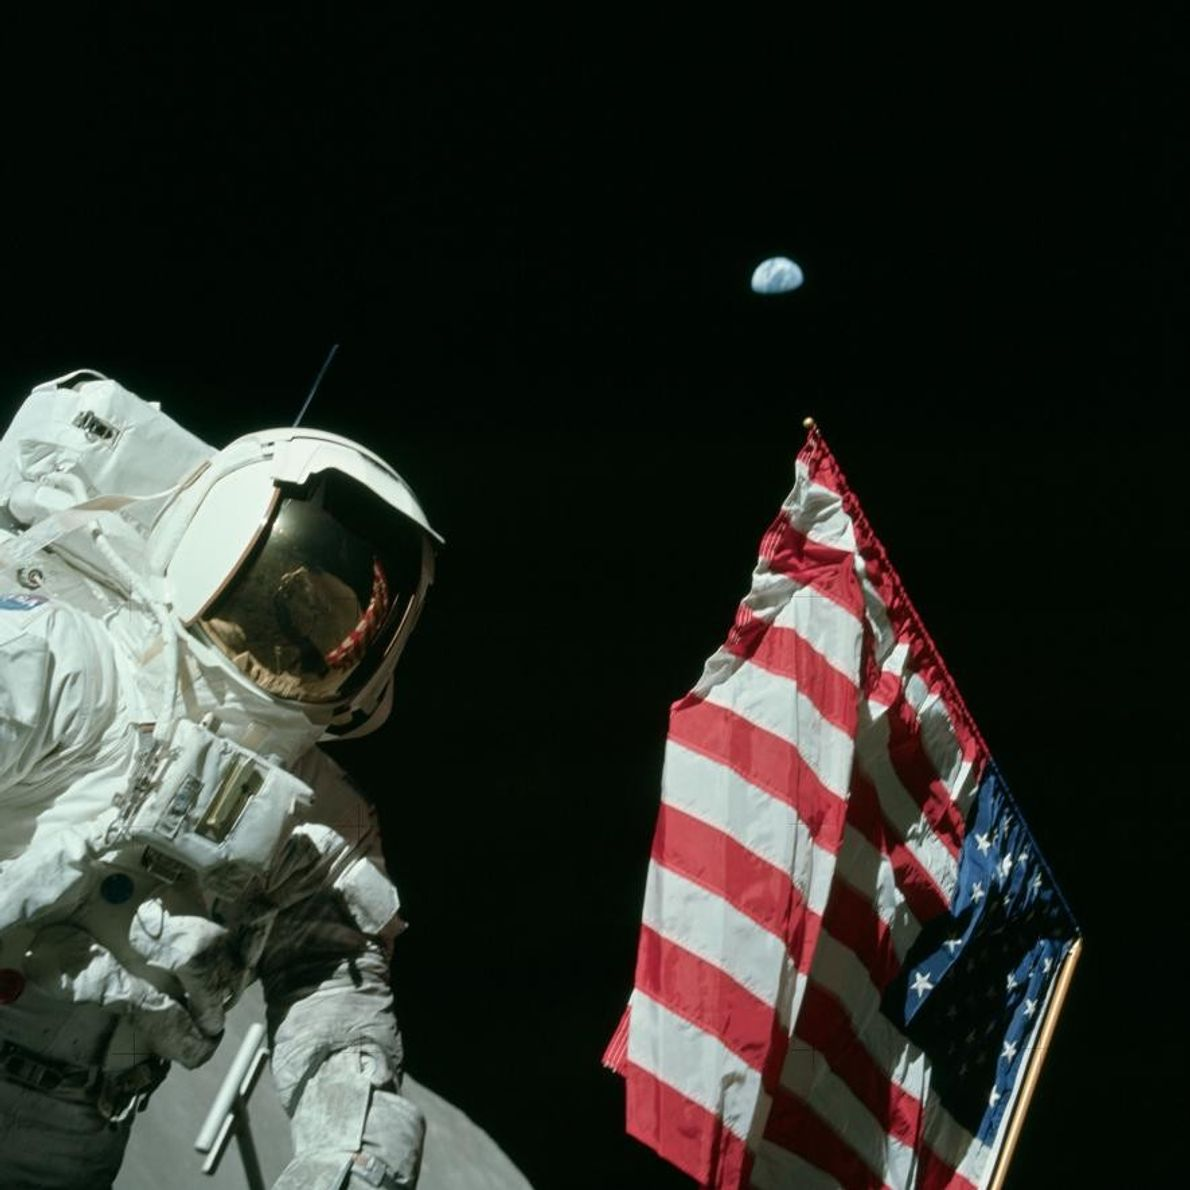 Harrison Schmitt neben der Flagge der USA